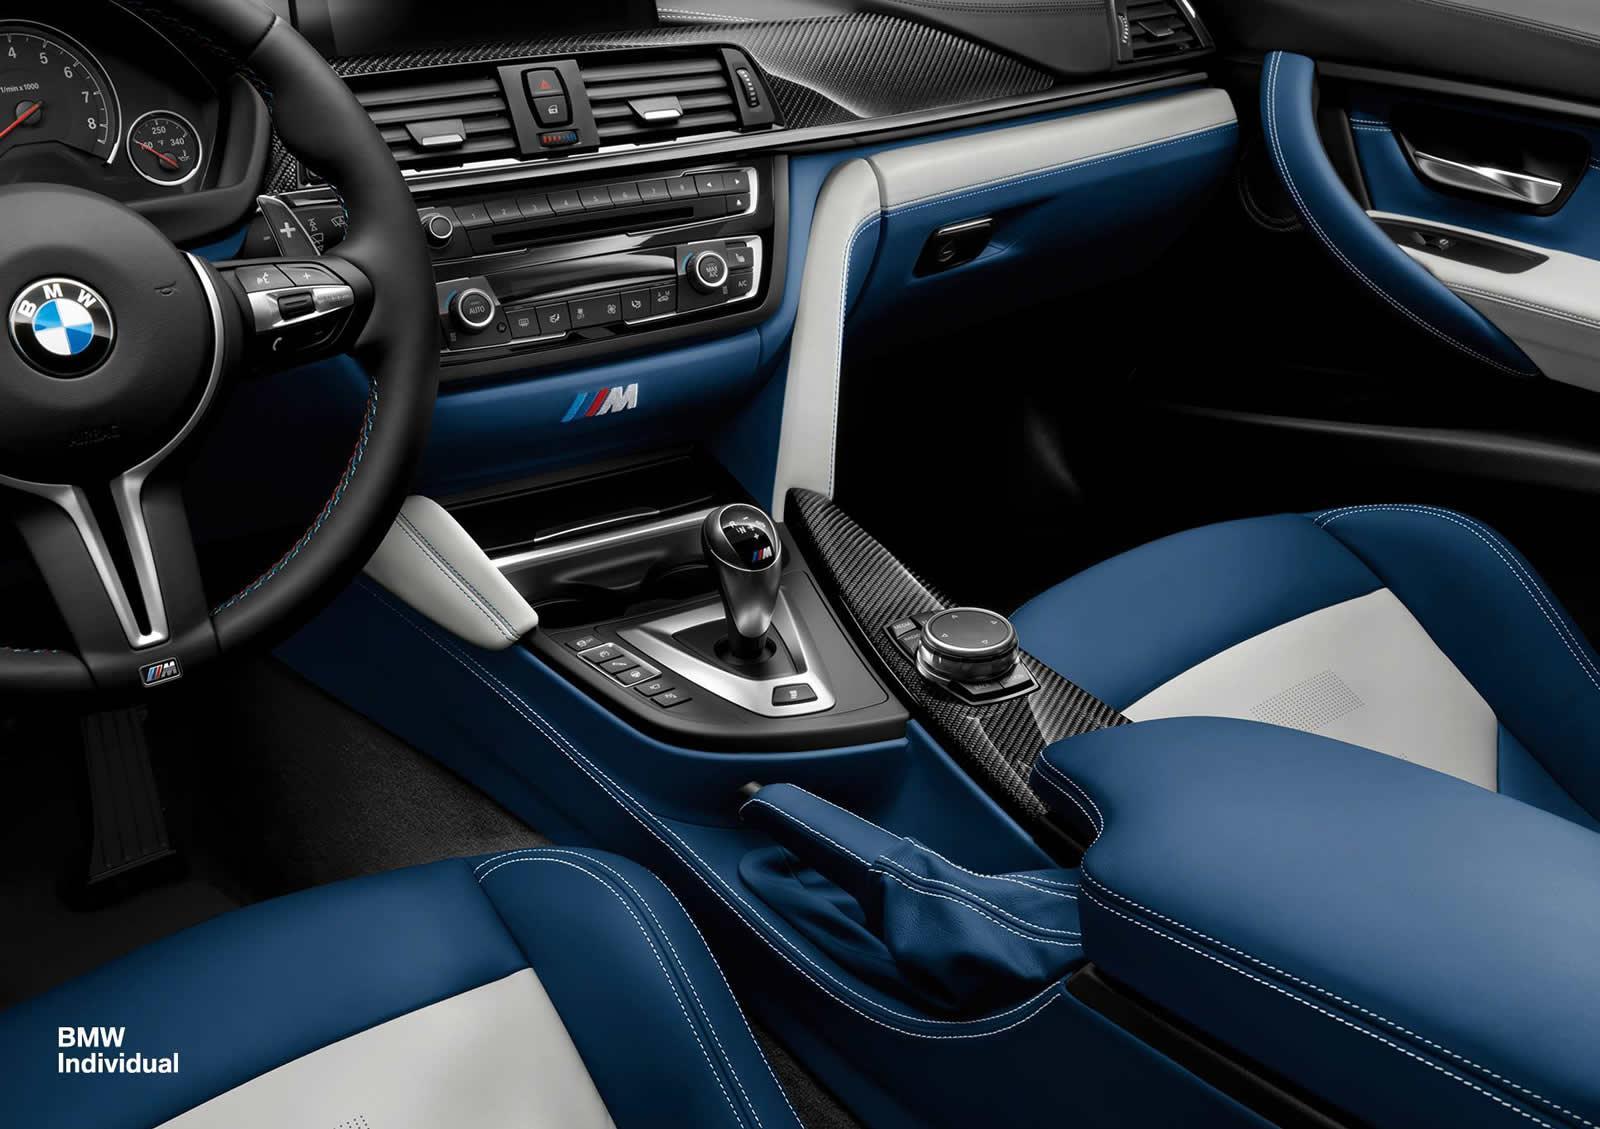 BMW Convertible bmw individual badge BMW M3 with BMW Individual Interior Tweaks | BMWCoop